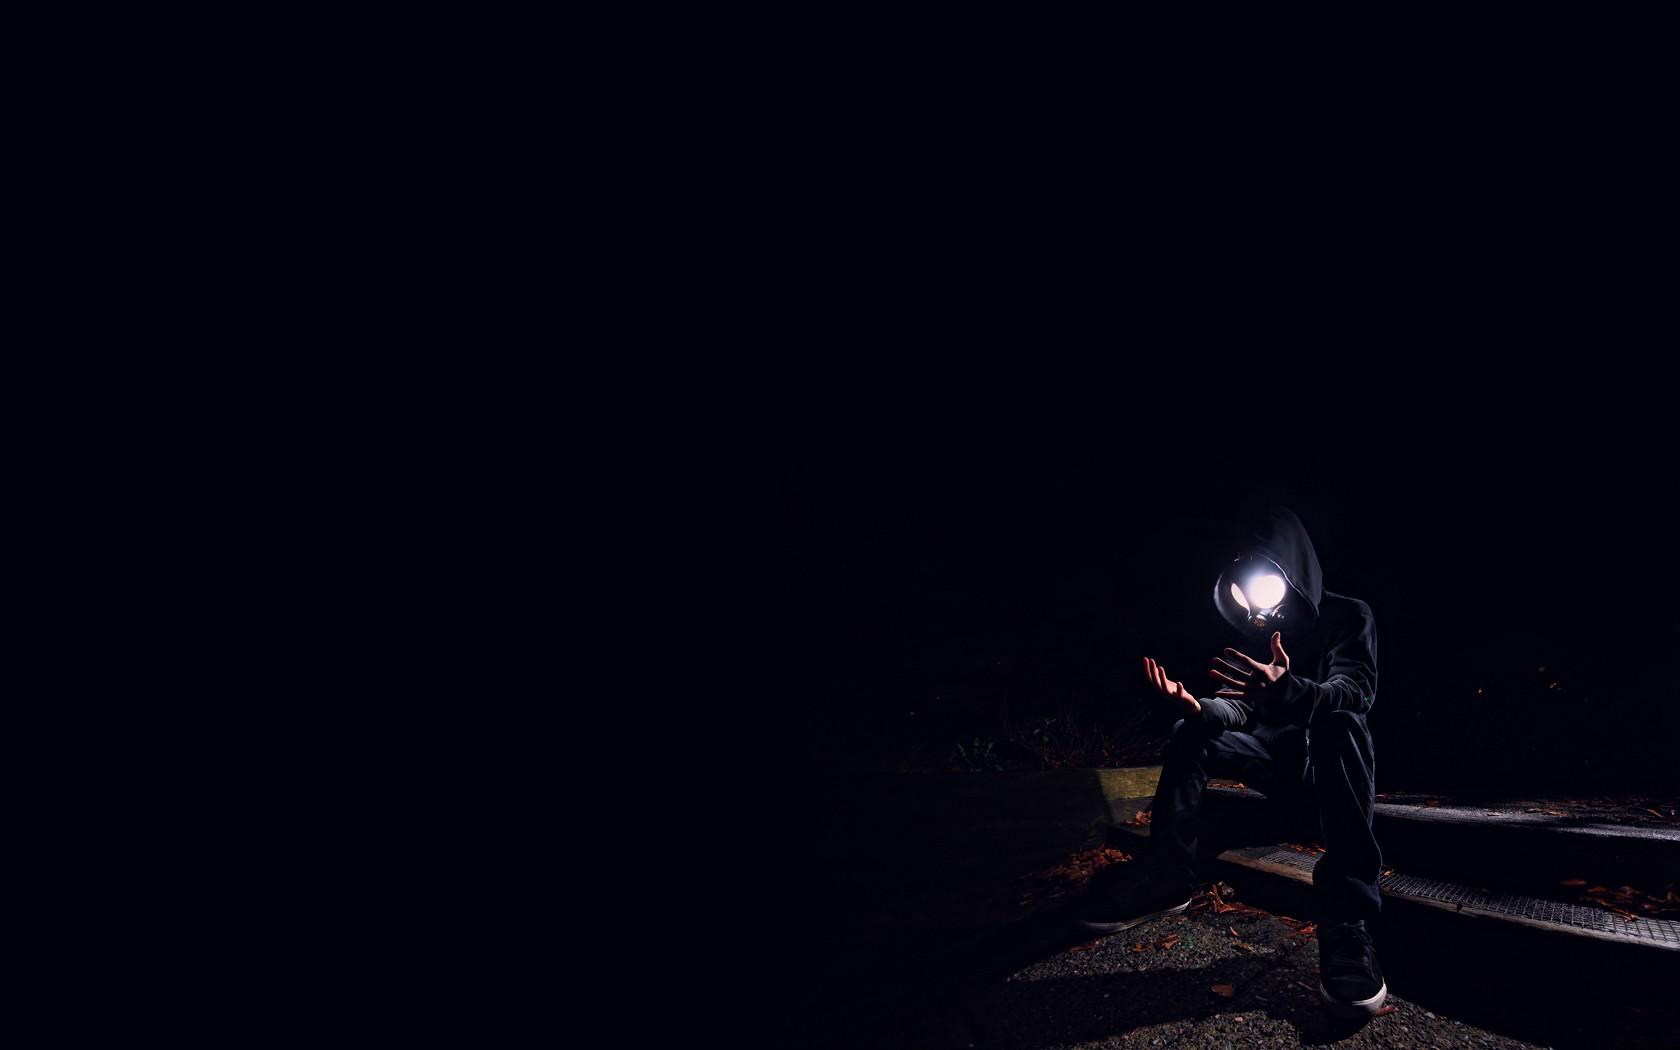 Lights People Black Dark Night Gas Masks Void Light Darkness Screenshot Computer Wallpaper